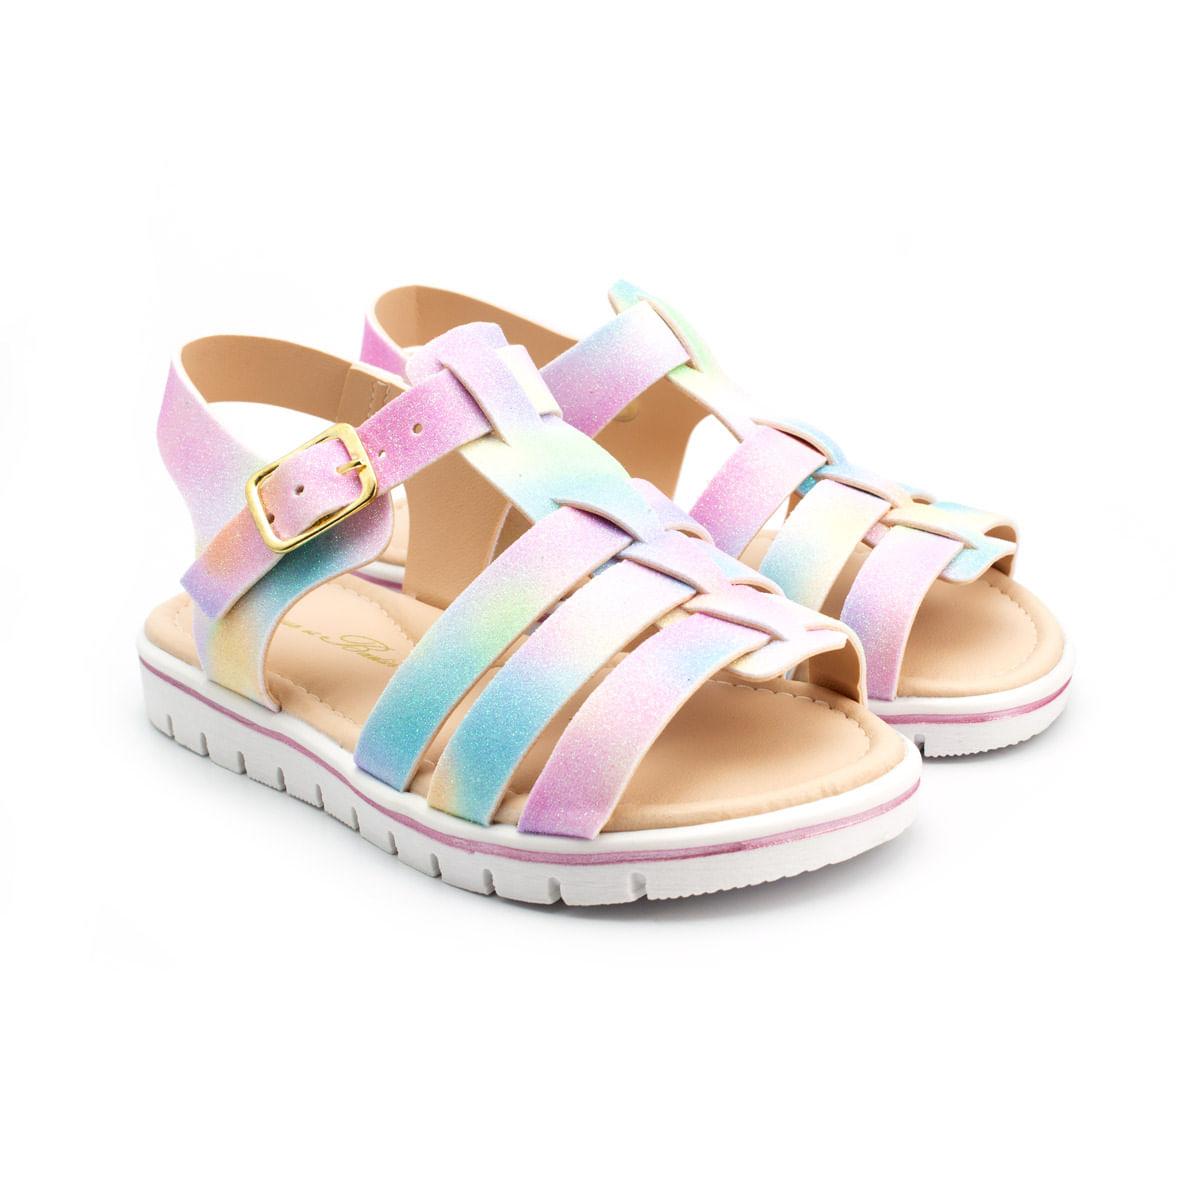 Sandalia-Infantil-Menina-Tie-Dye-Cinderela-3-Tiras--23-ao-32-